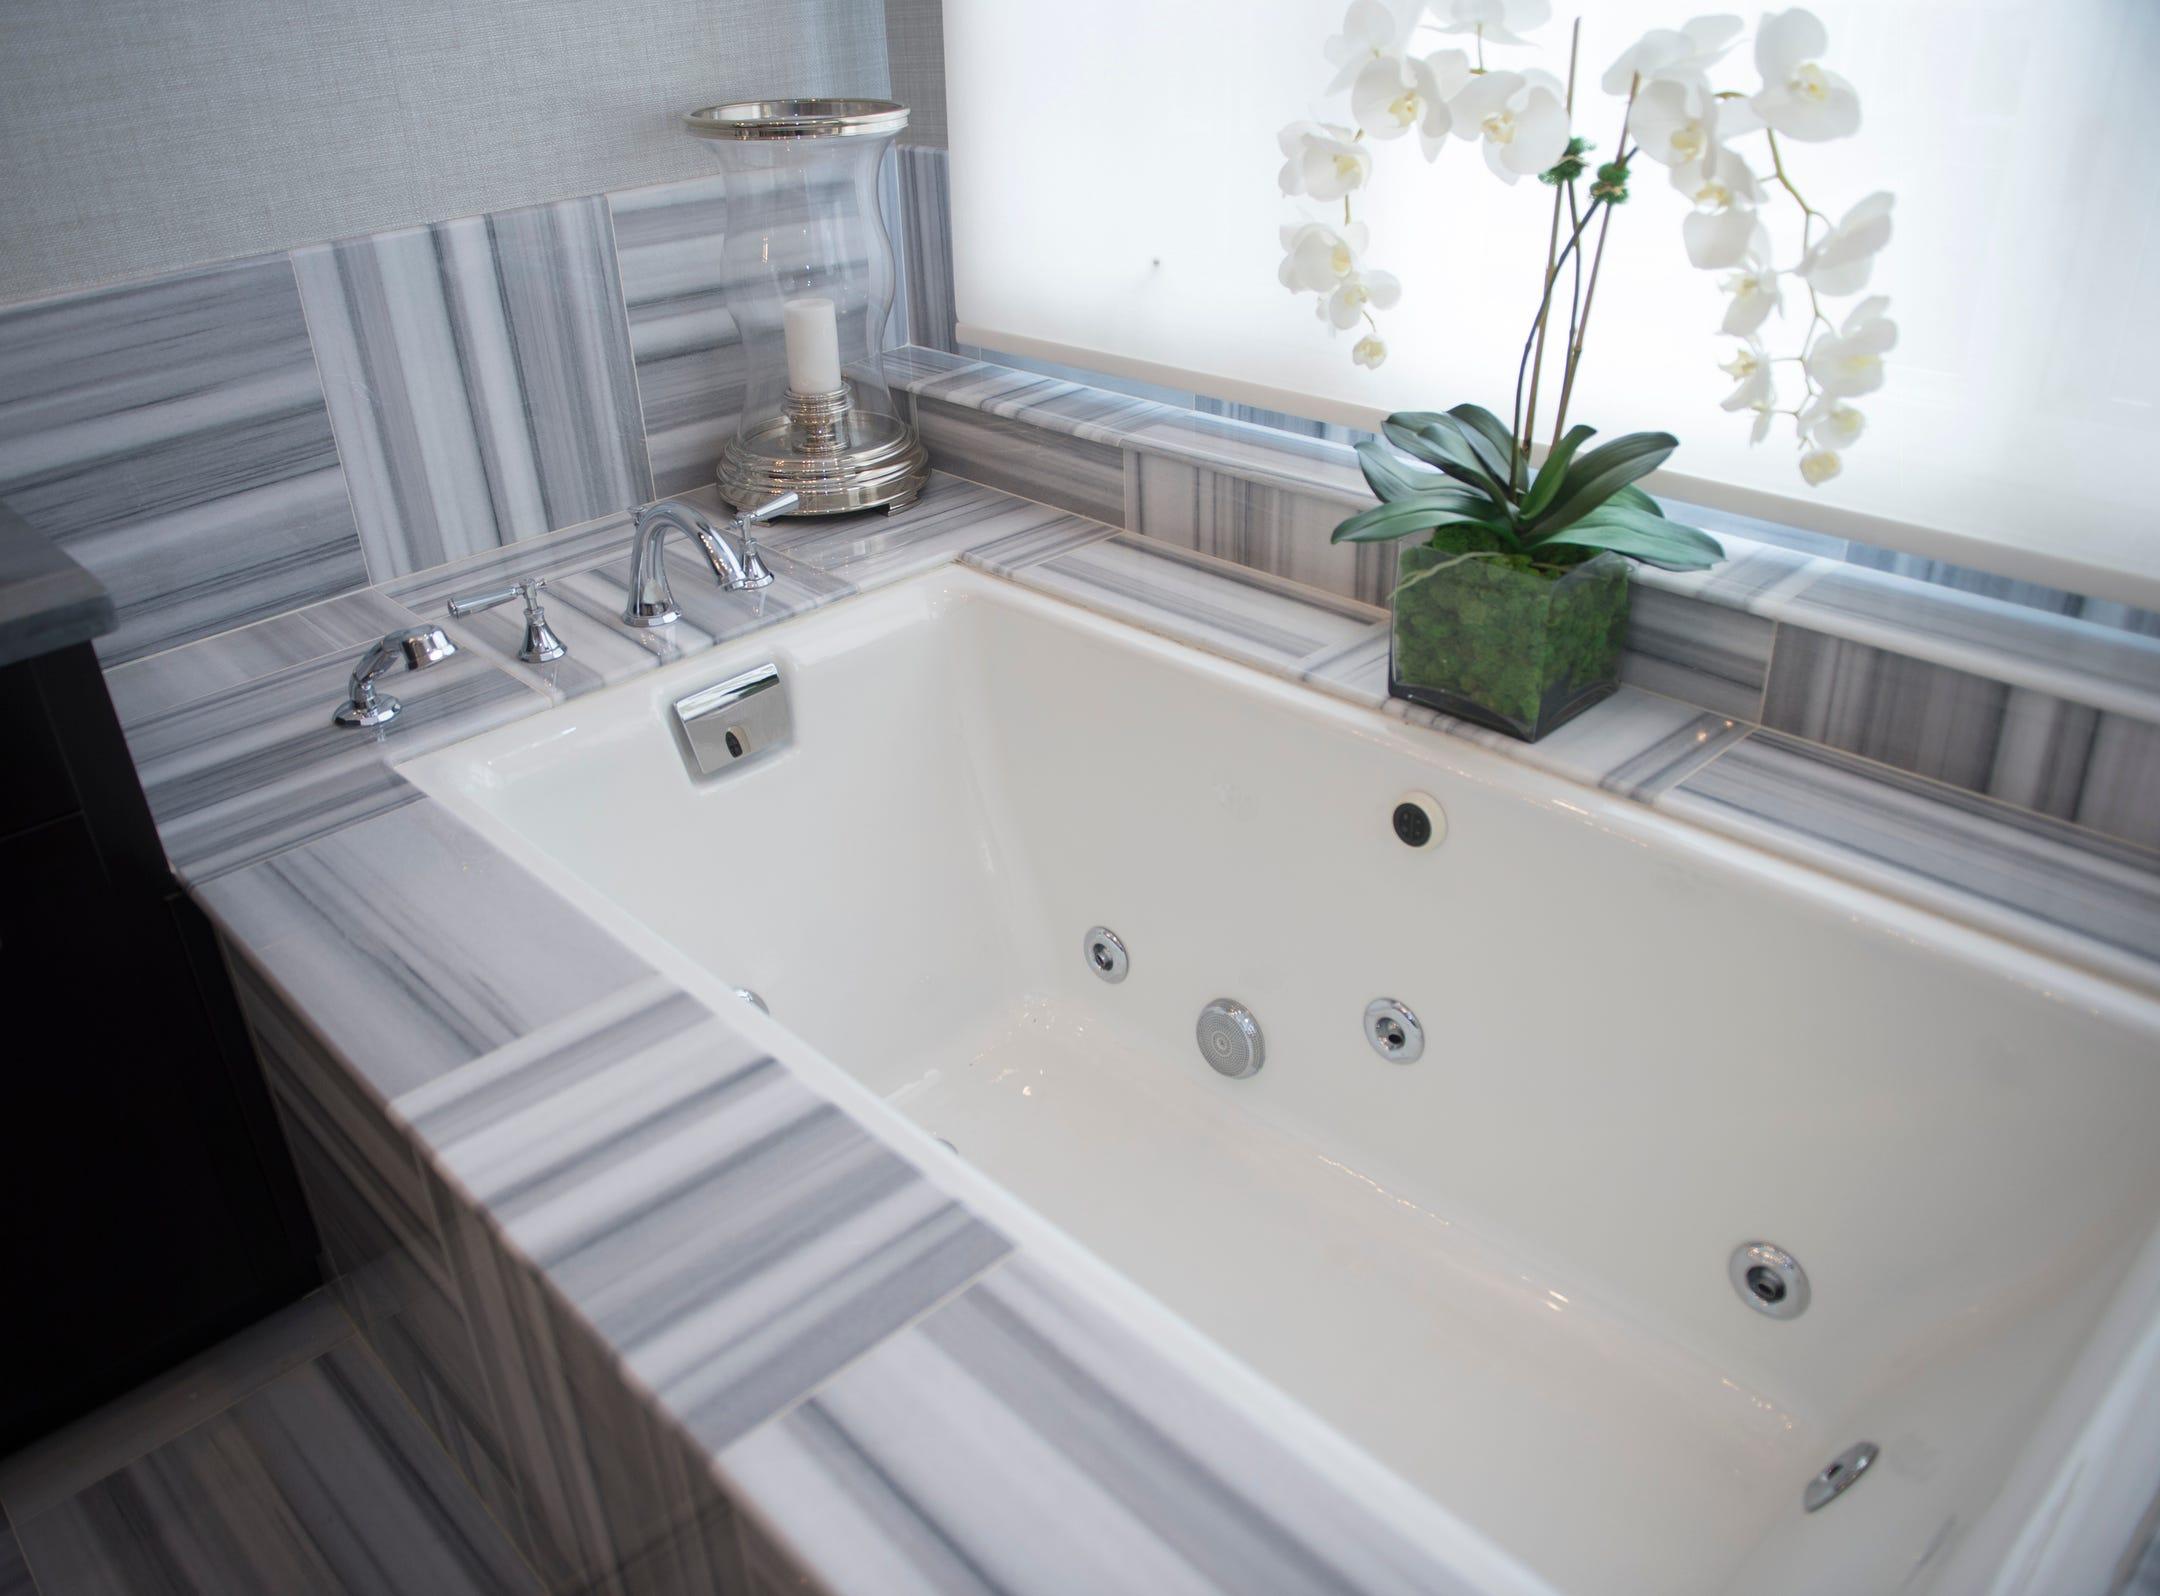 The master bathroom includes a hot tub.